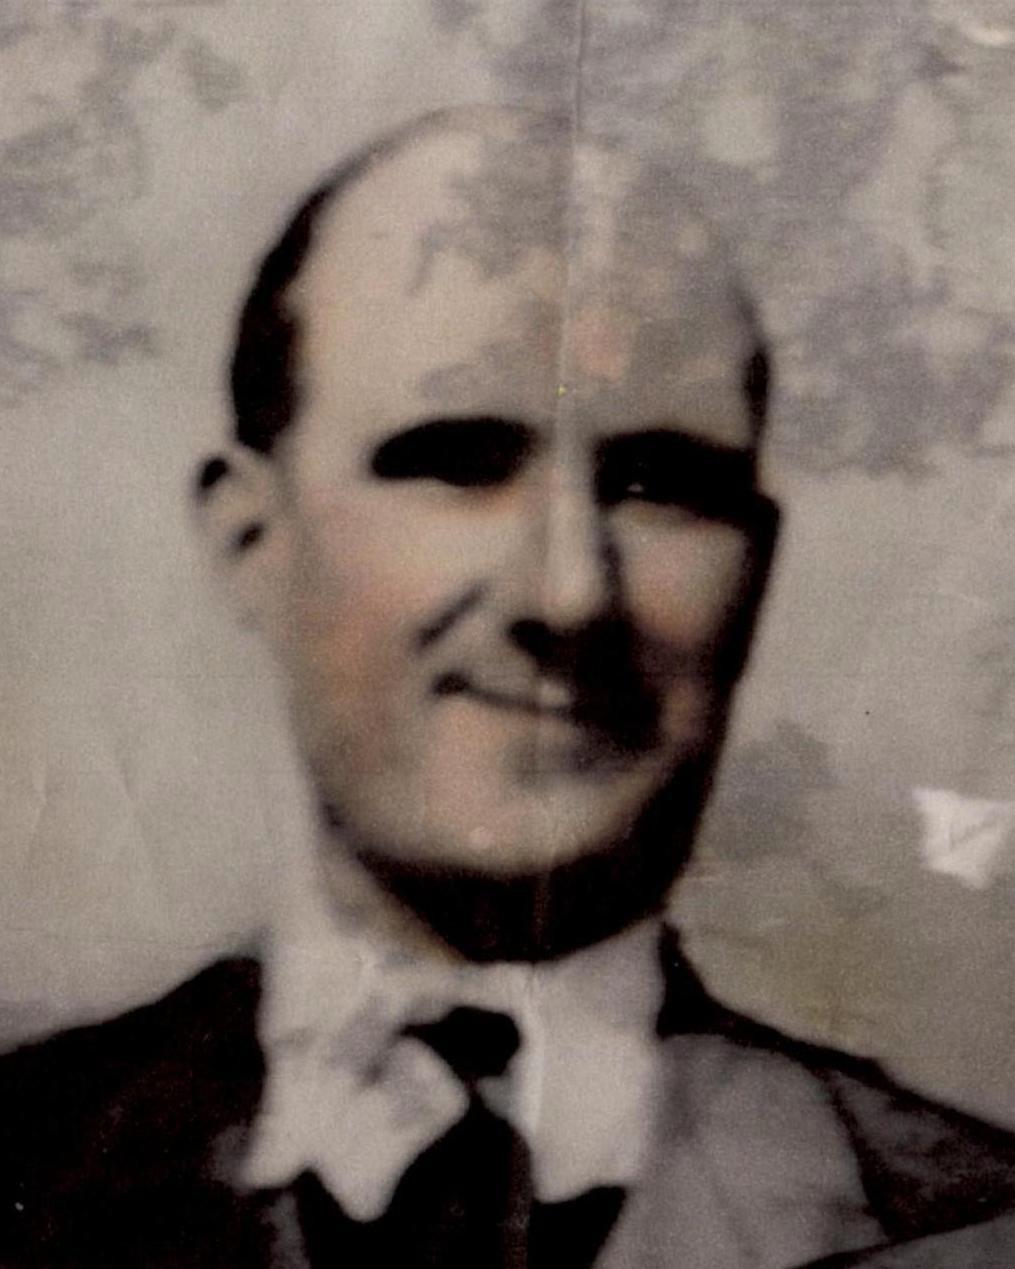 Richard Charles Evans